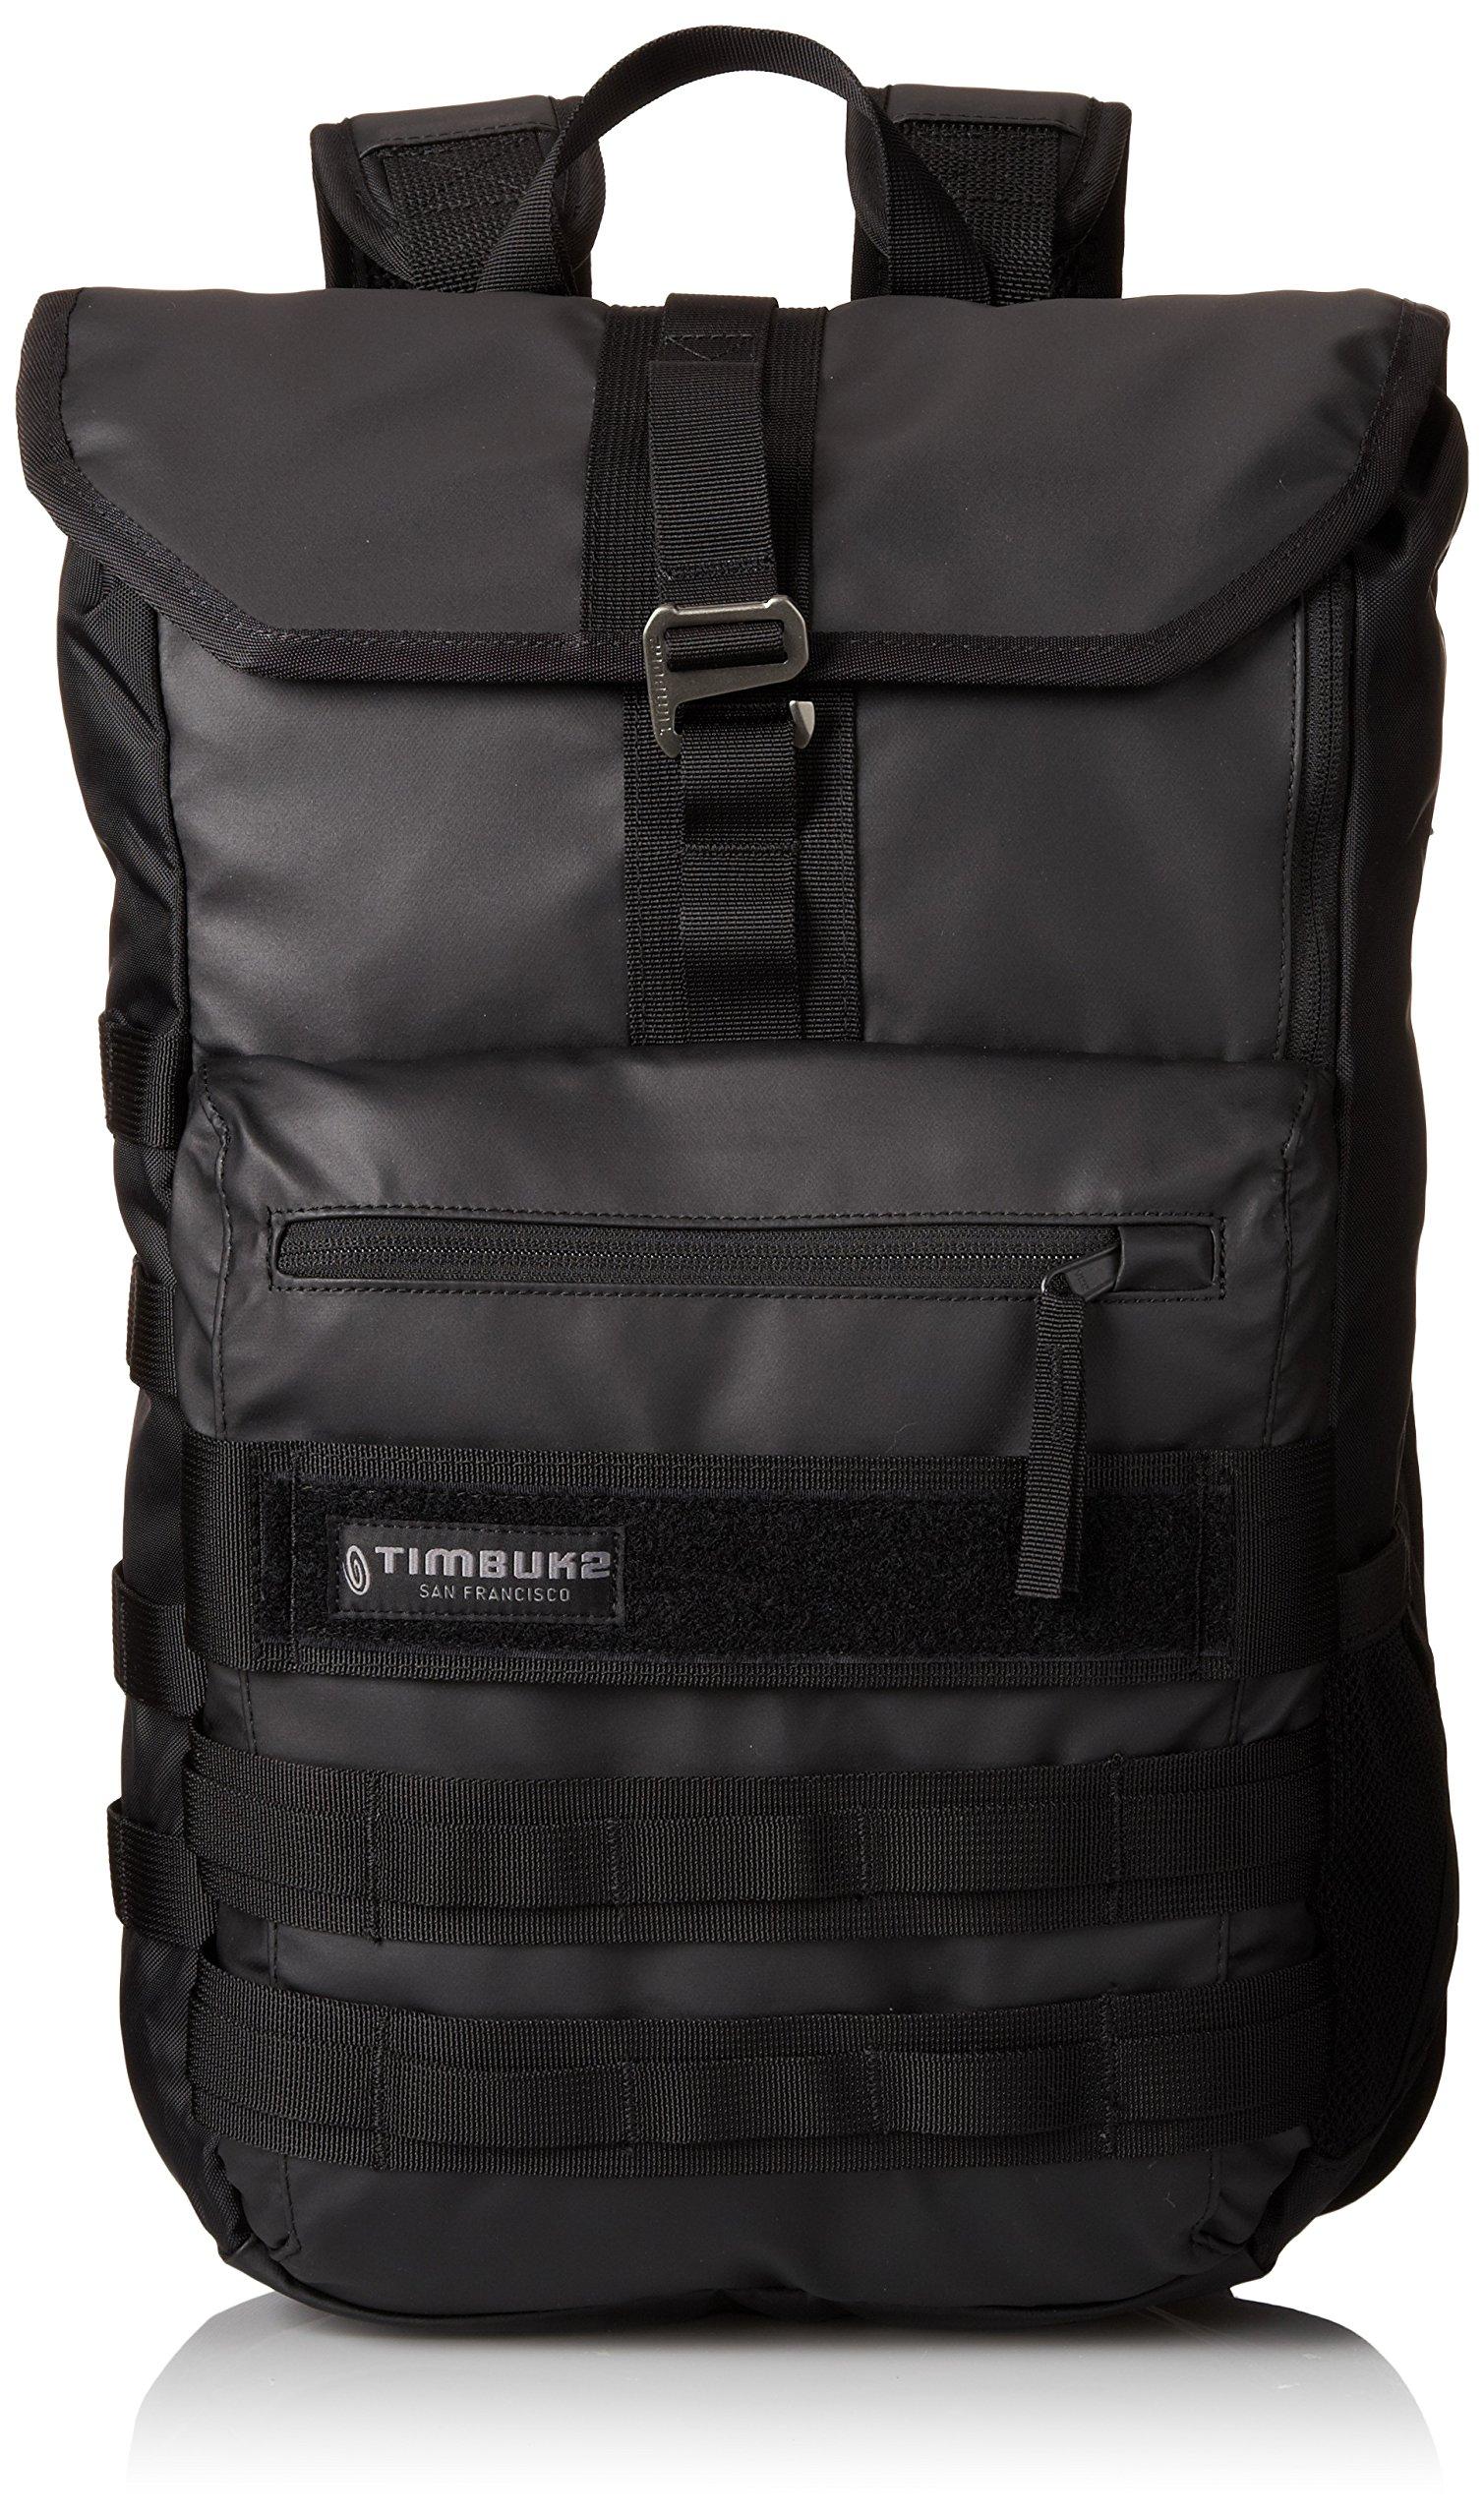 Timbuk2 Spire Laptop Backpack, Black, One Size